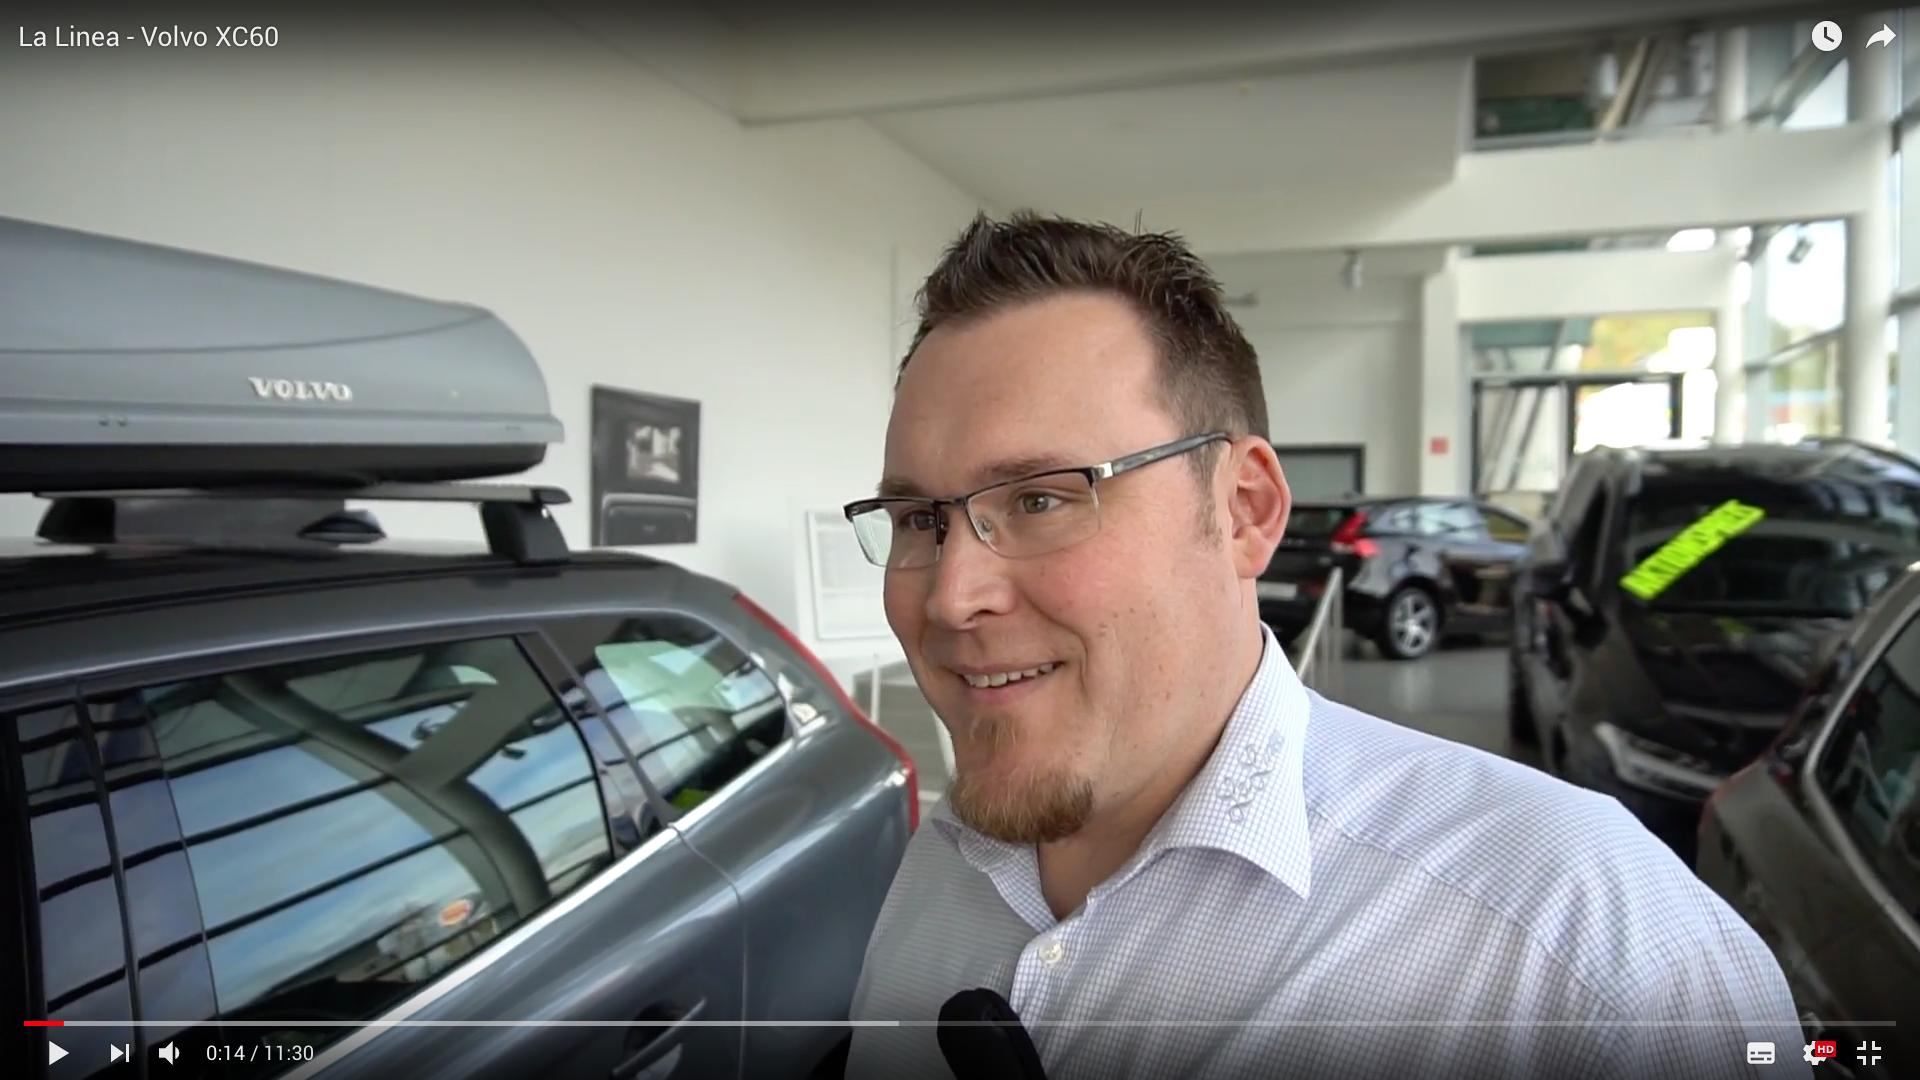 2017 La Linea - Volvo XC60_Kundenberater_MSM_MEDIEN_SAAR_MOSEL_SAARLAND_FERNSEHEN_1_ED_SAAR